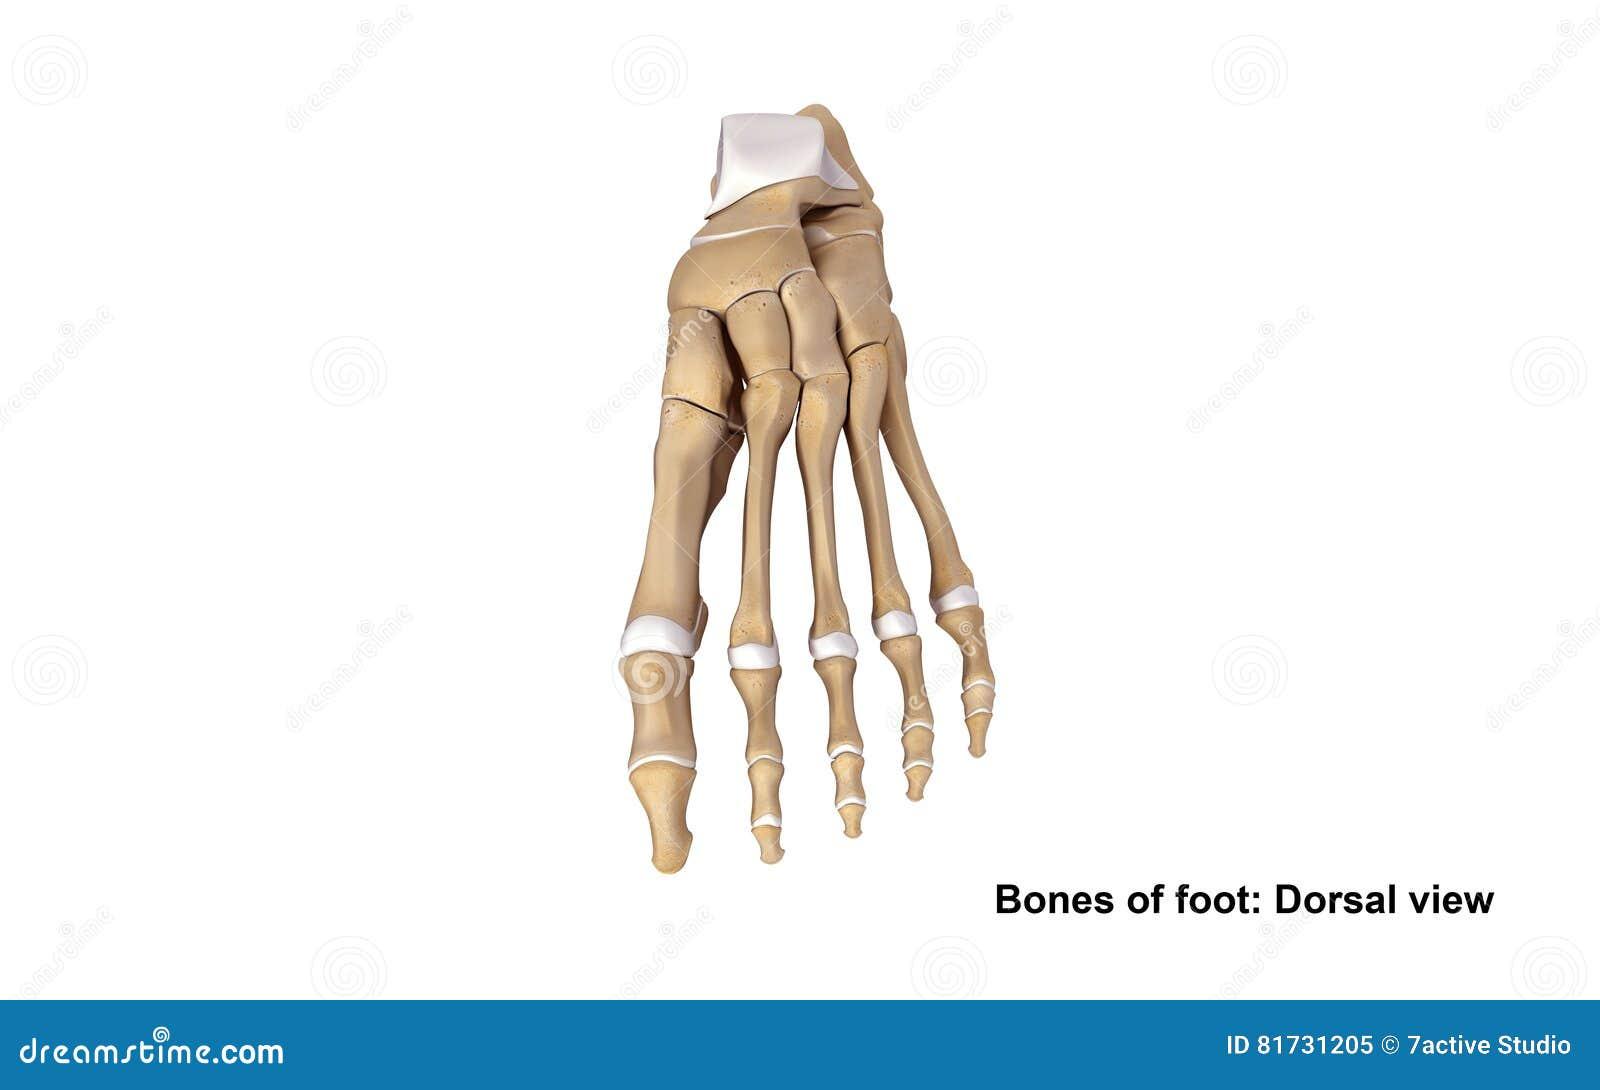 Foot Dorsal view stock illustration. Illustration of pisiform - 81731205